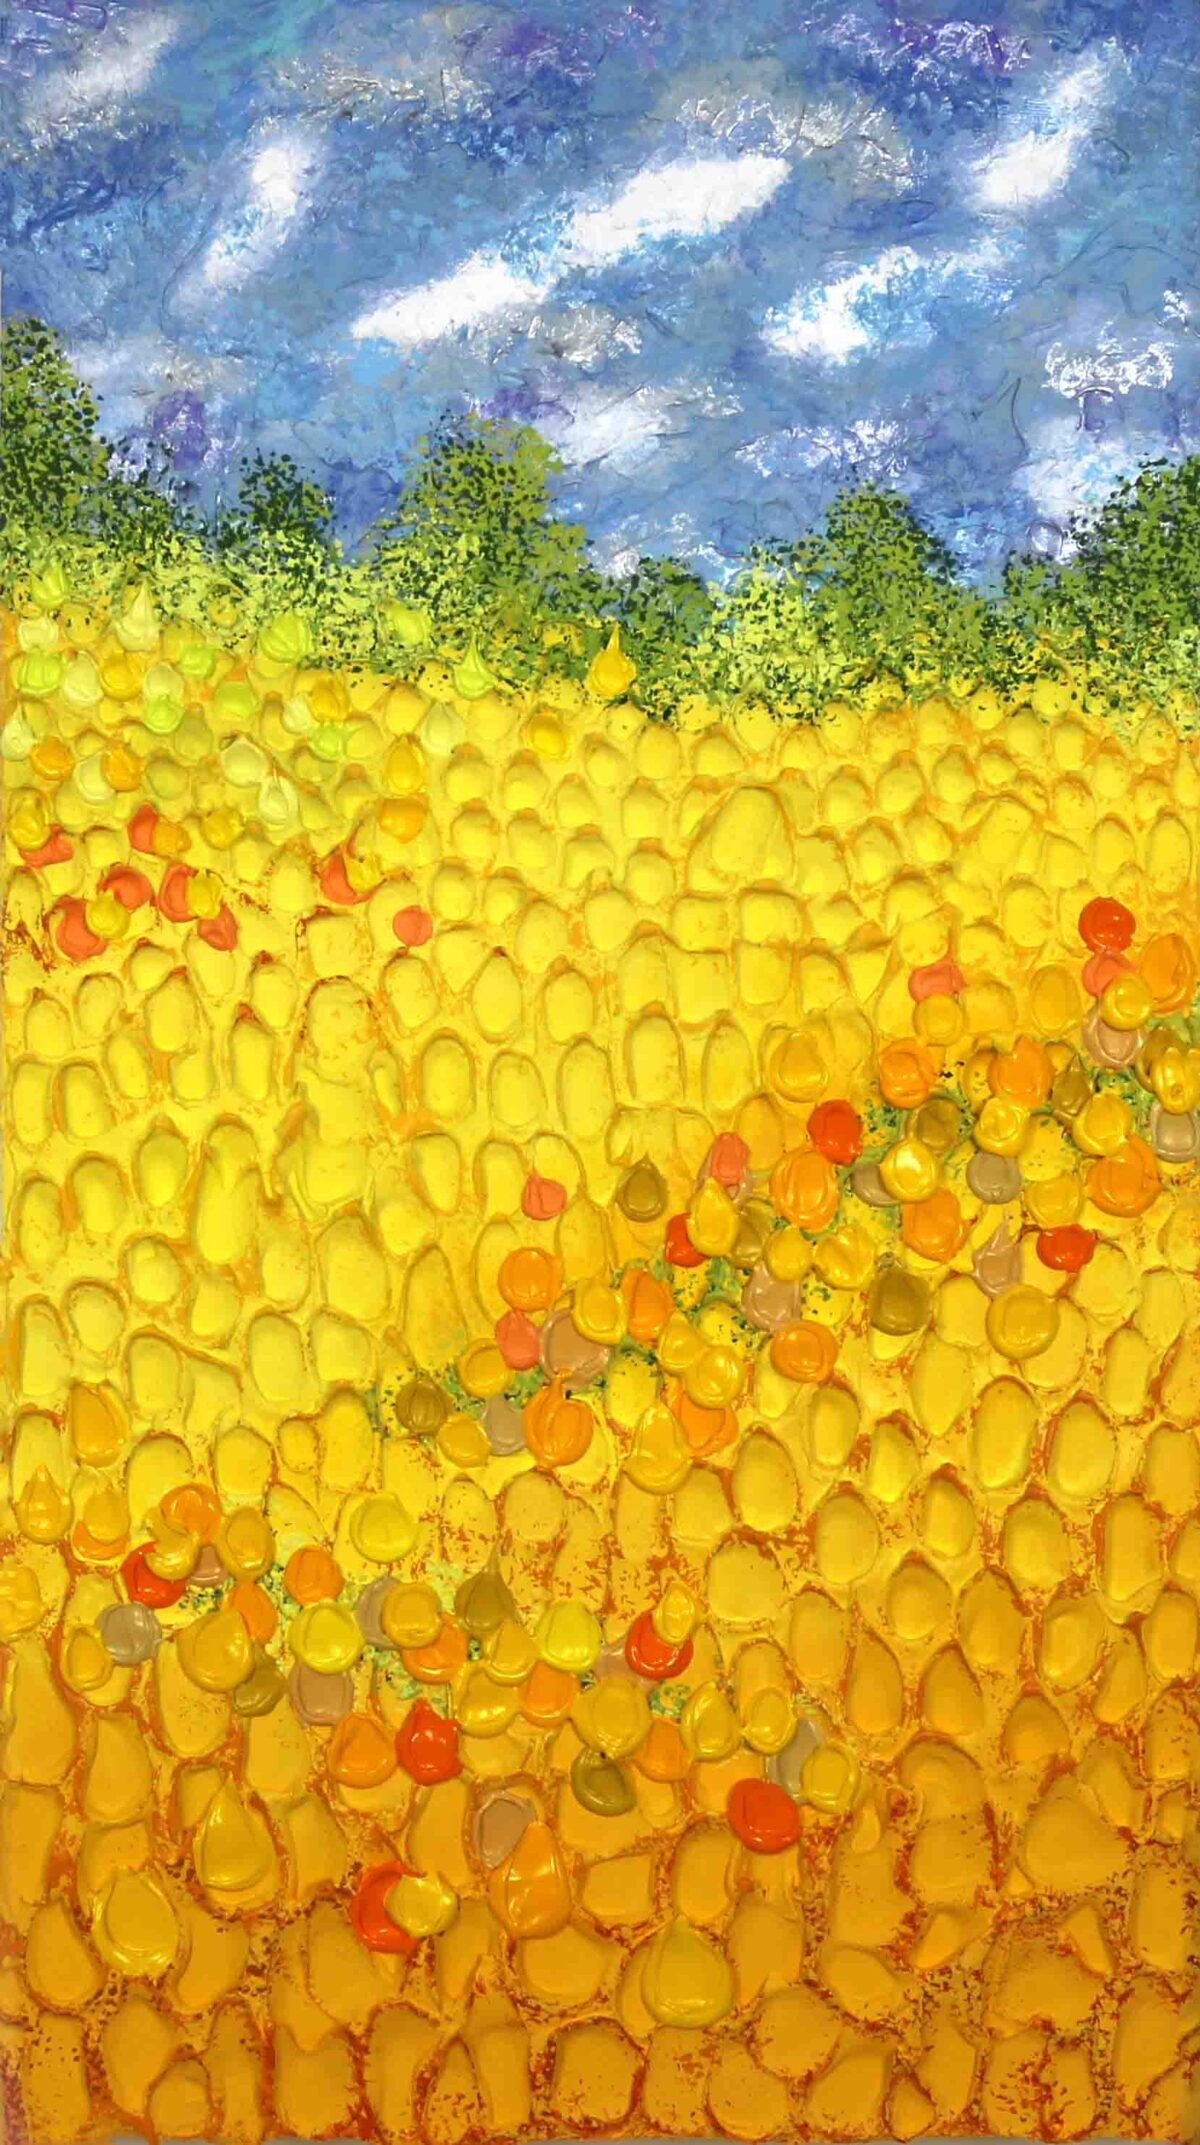 Sunny in Amsterdam - Jeff Hanson Art Original Painting